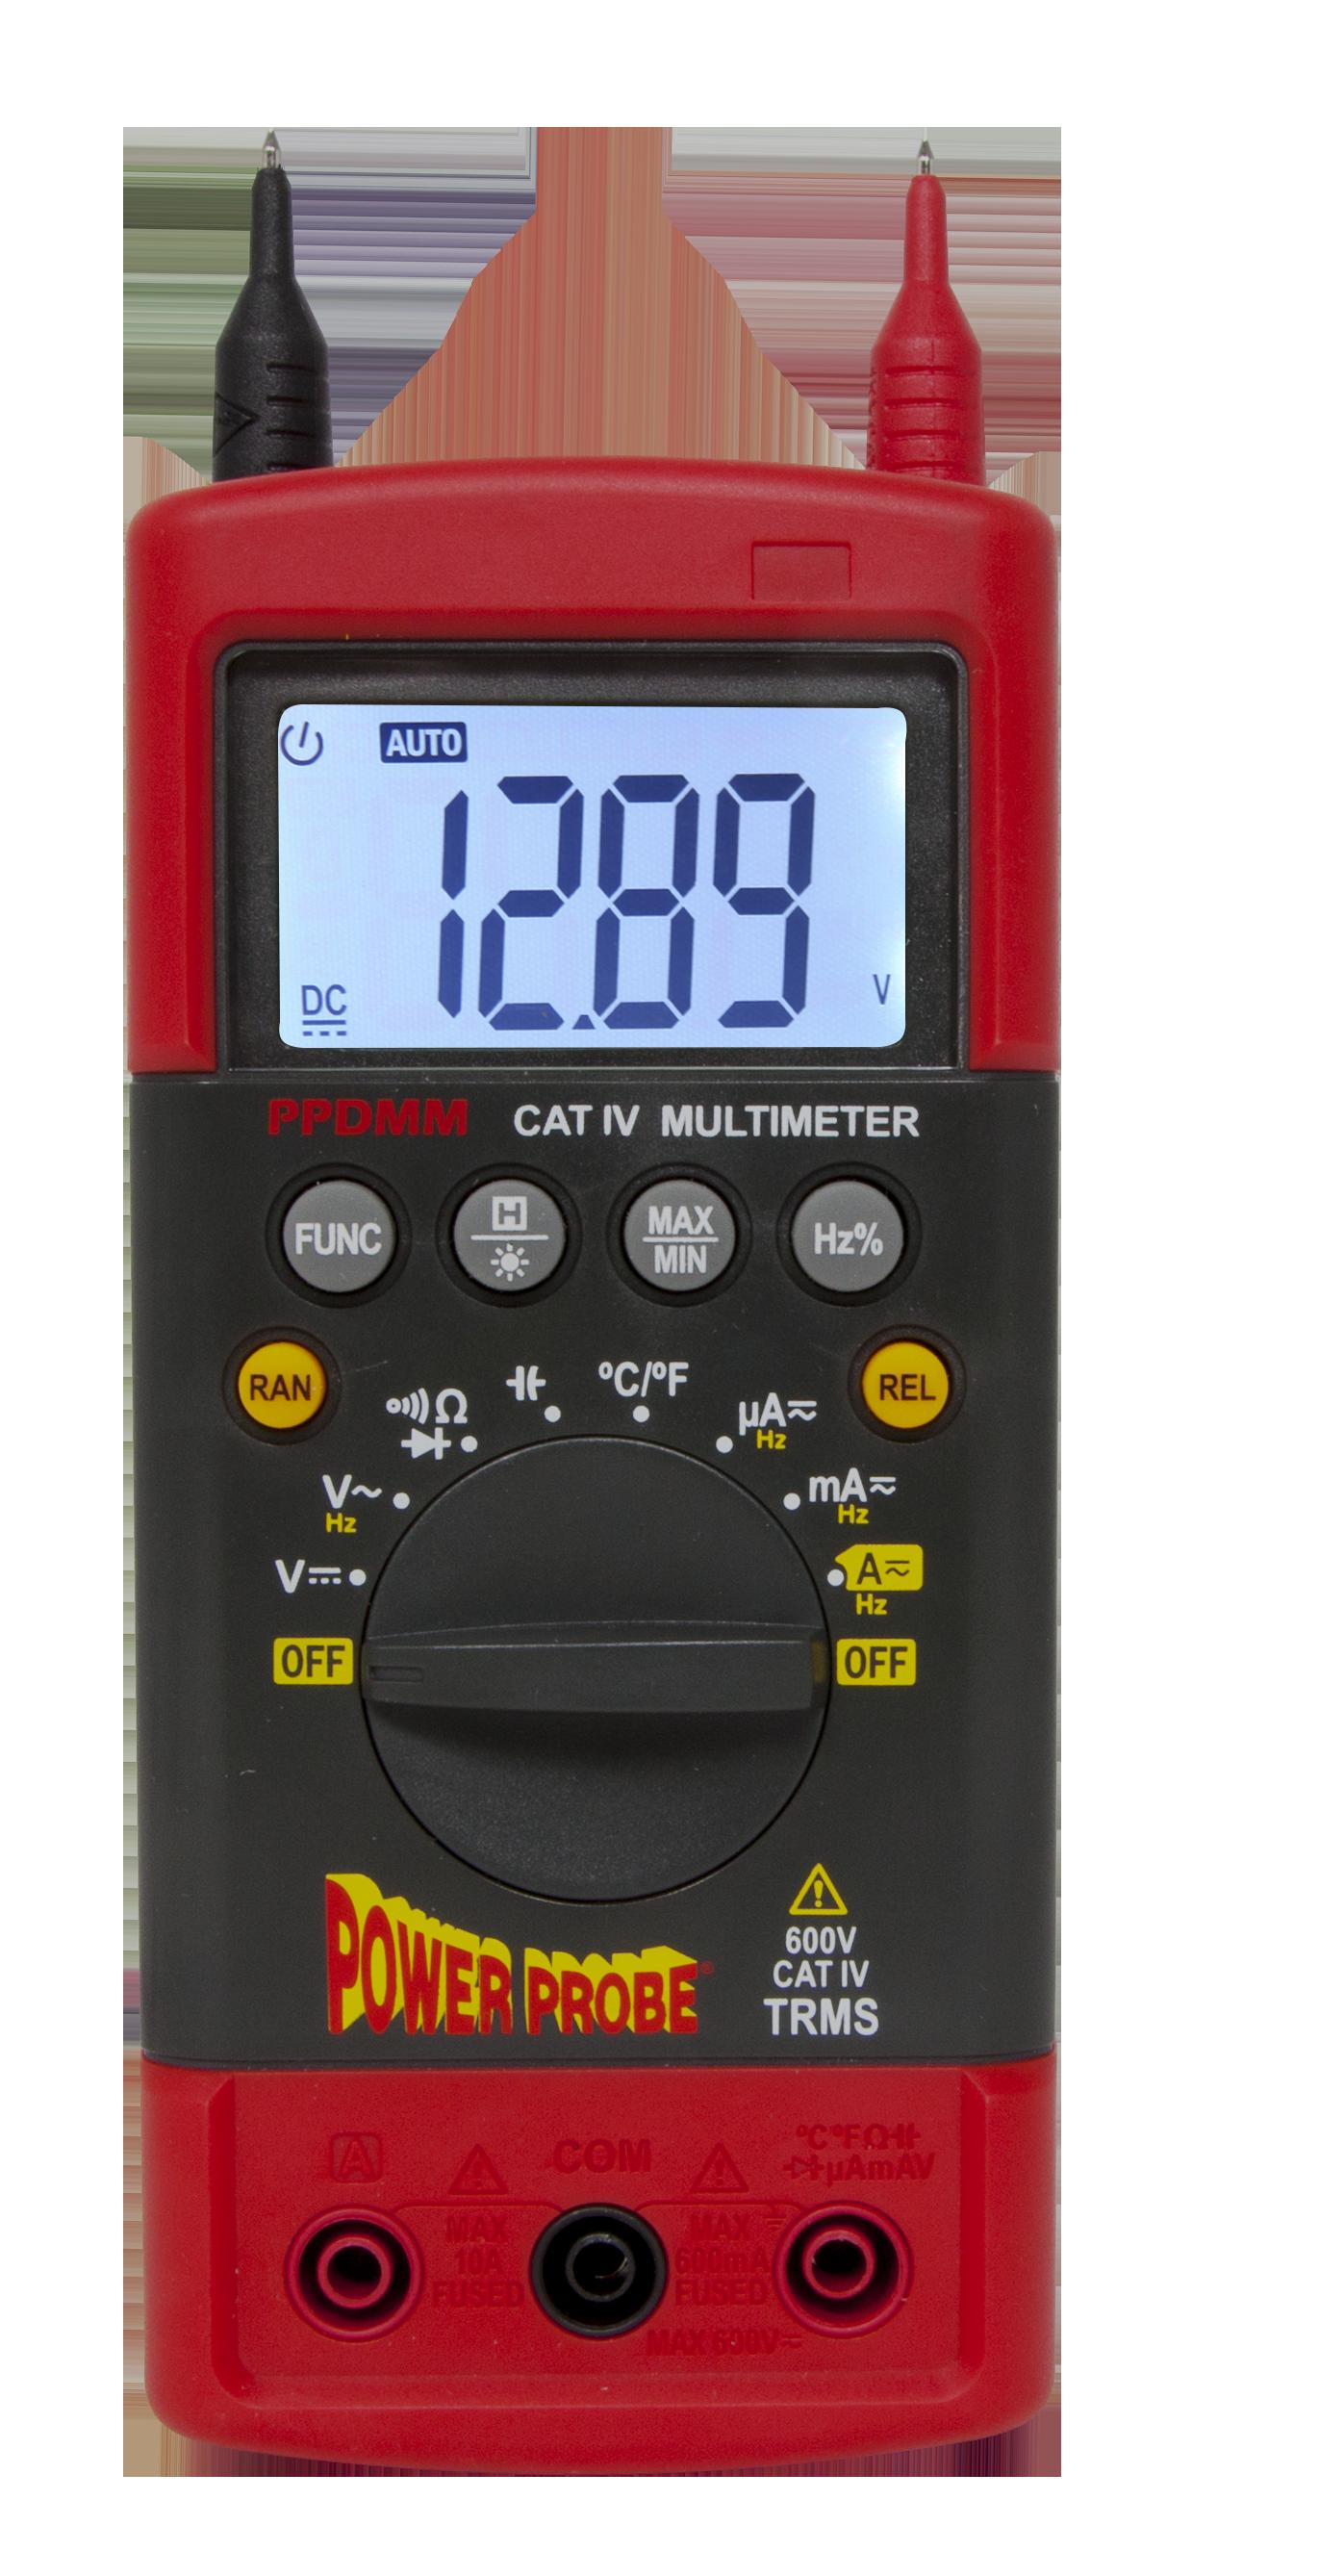 Automotive Digital Multimeter : Amazon power probe cativ digital multimeter automotive